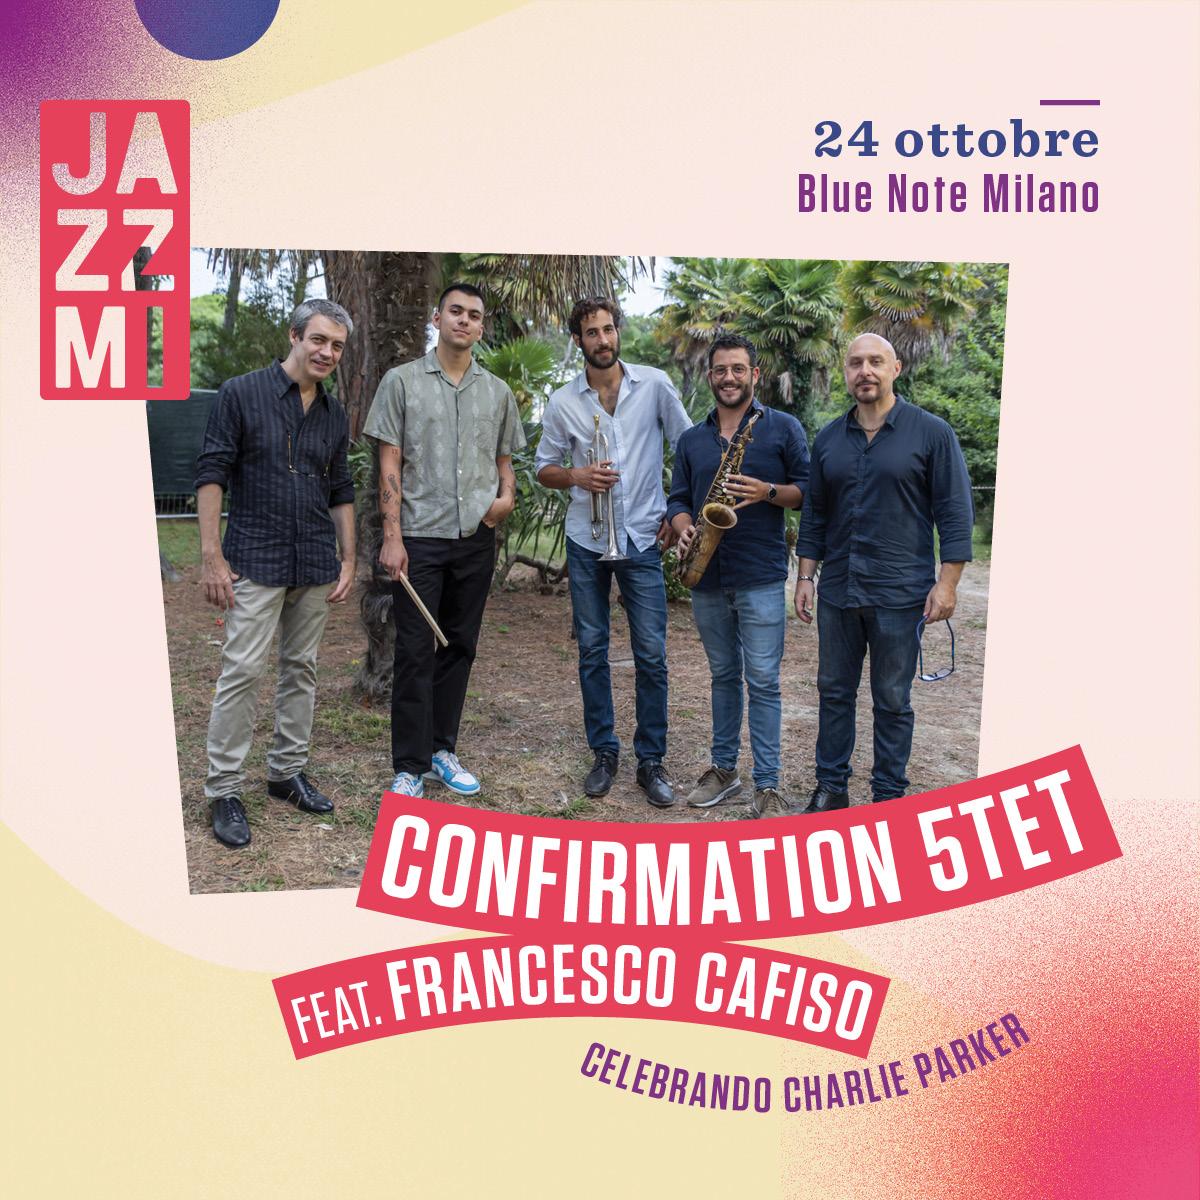 JAZZMI Confirmation 5tet feat. Francesco Cafiso – Celebrando Charlie Parker 24/10/2020 20.30